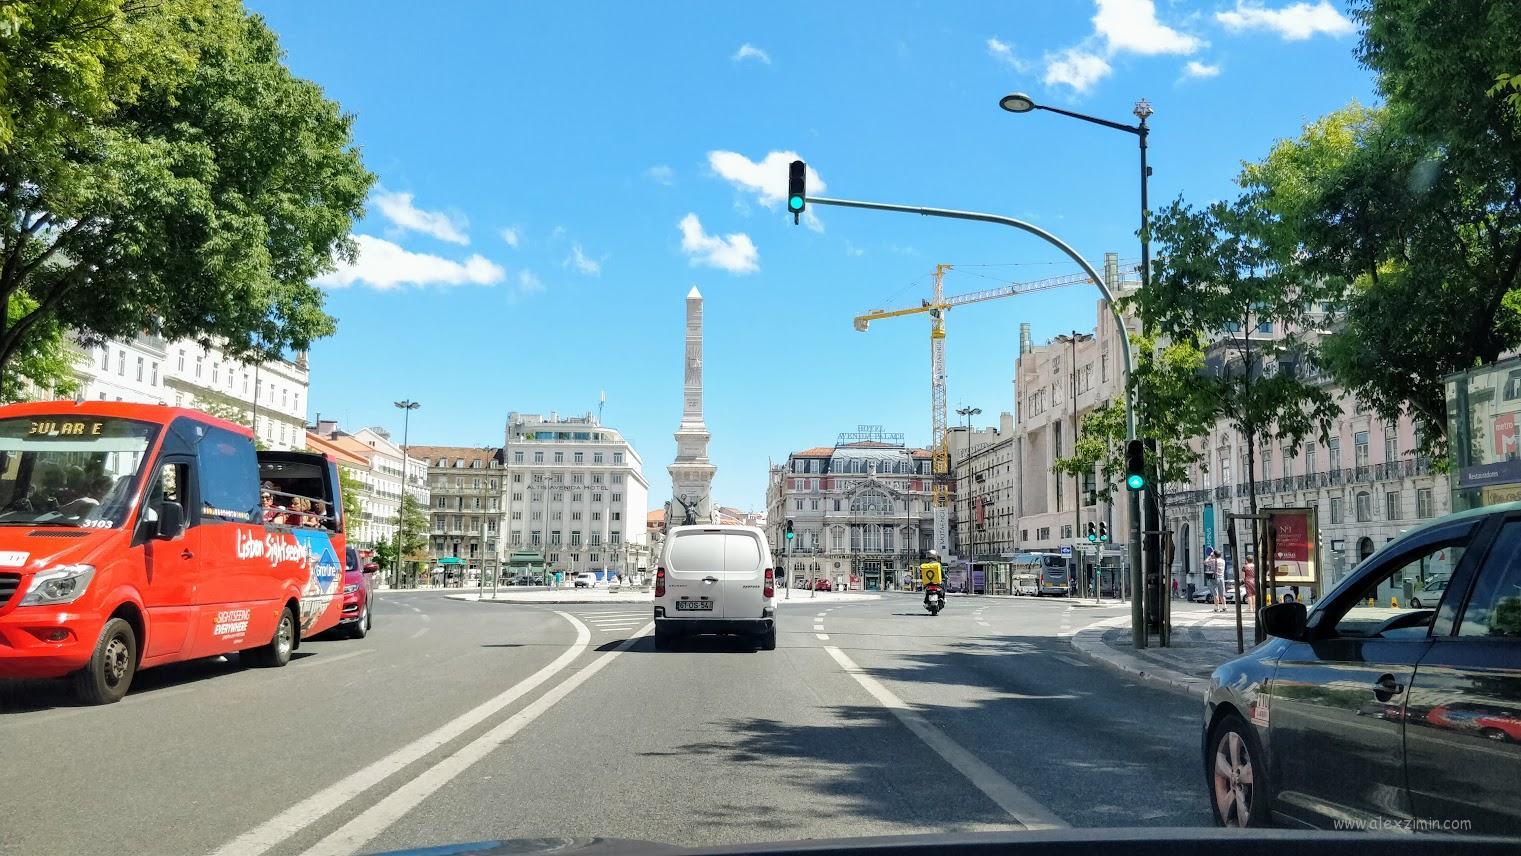 Дороги в Португалии. Центр Лиссабона